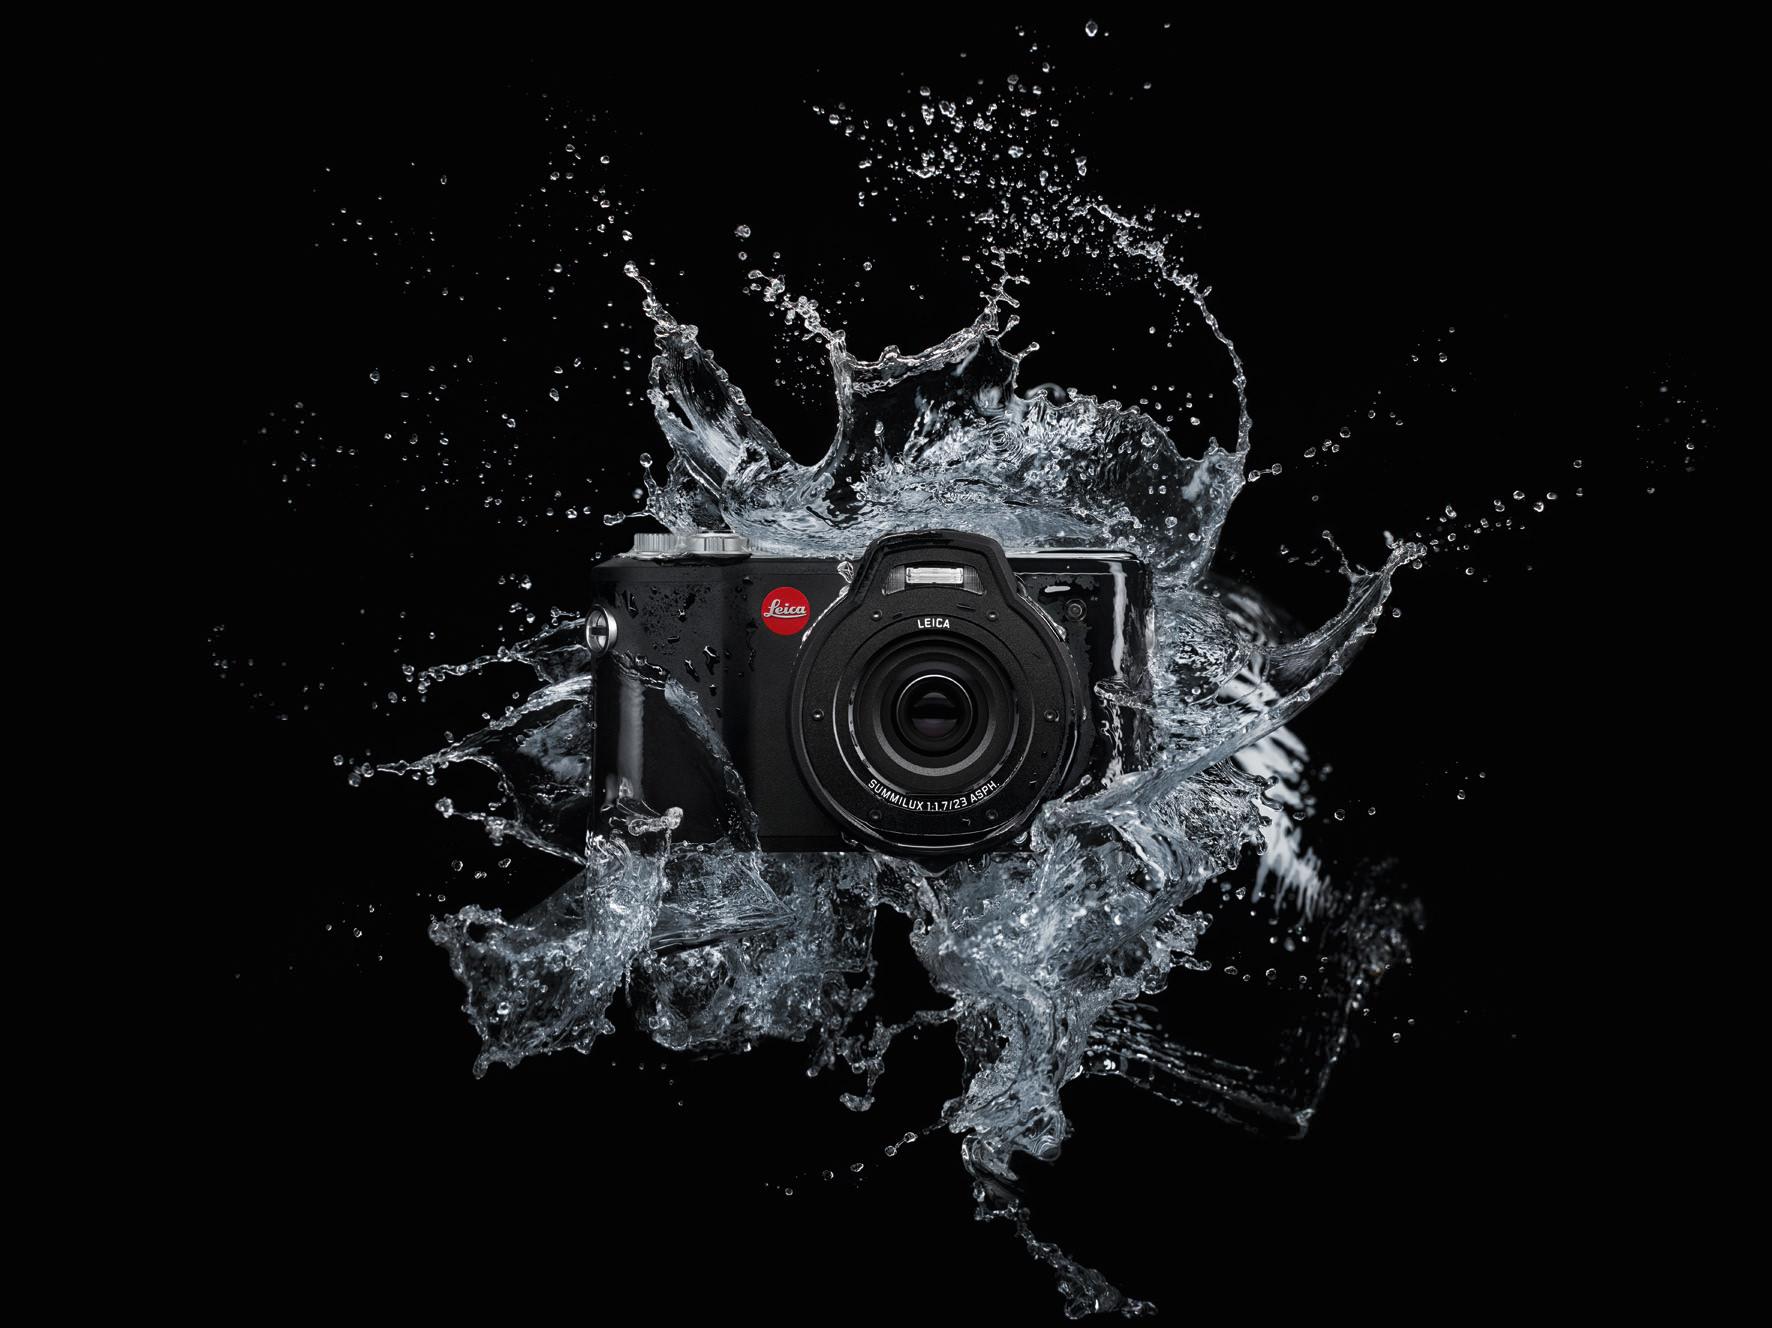 OP Leica X U splash image